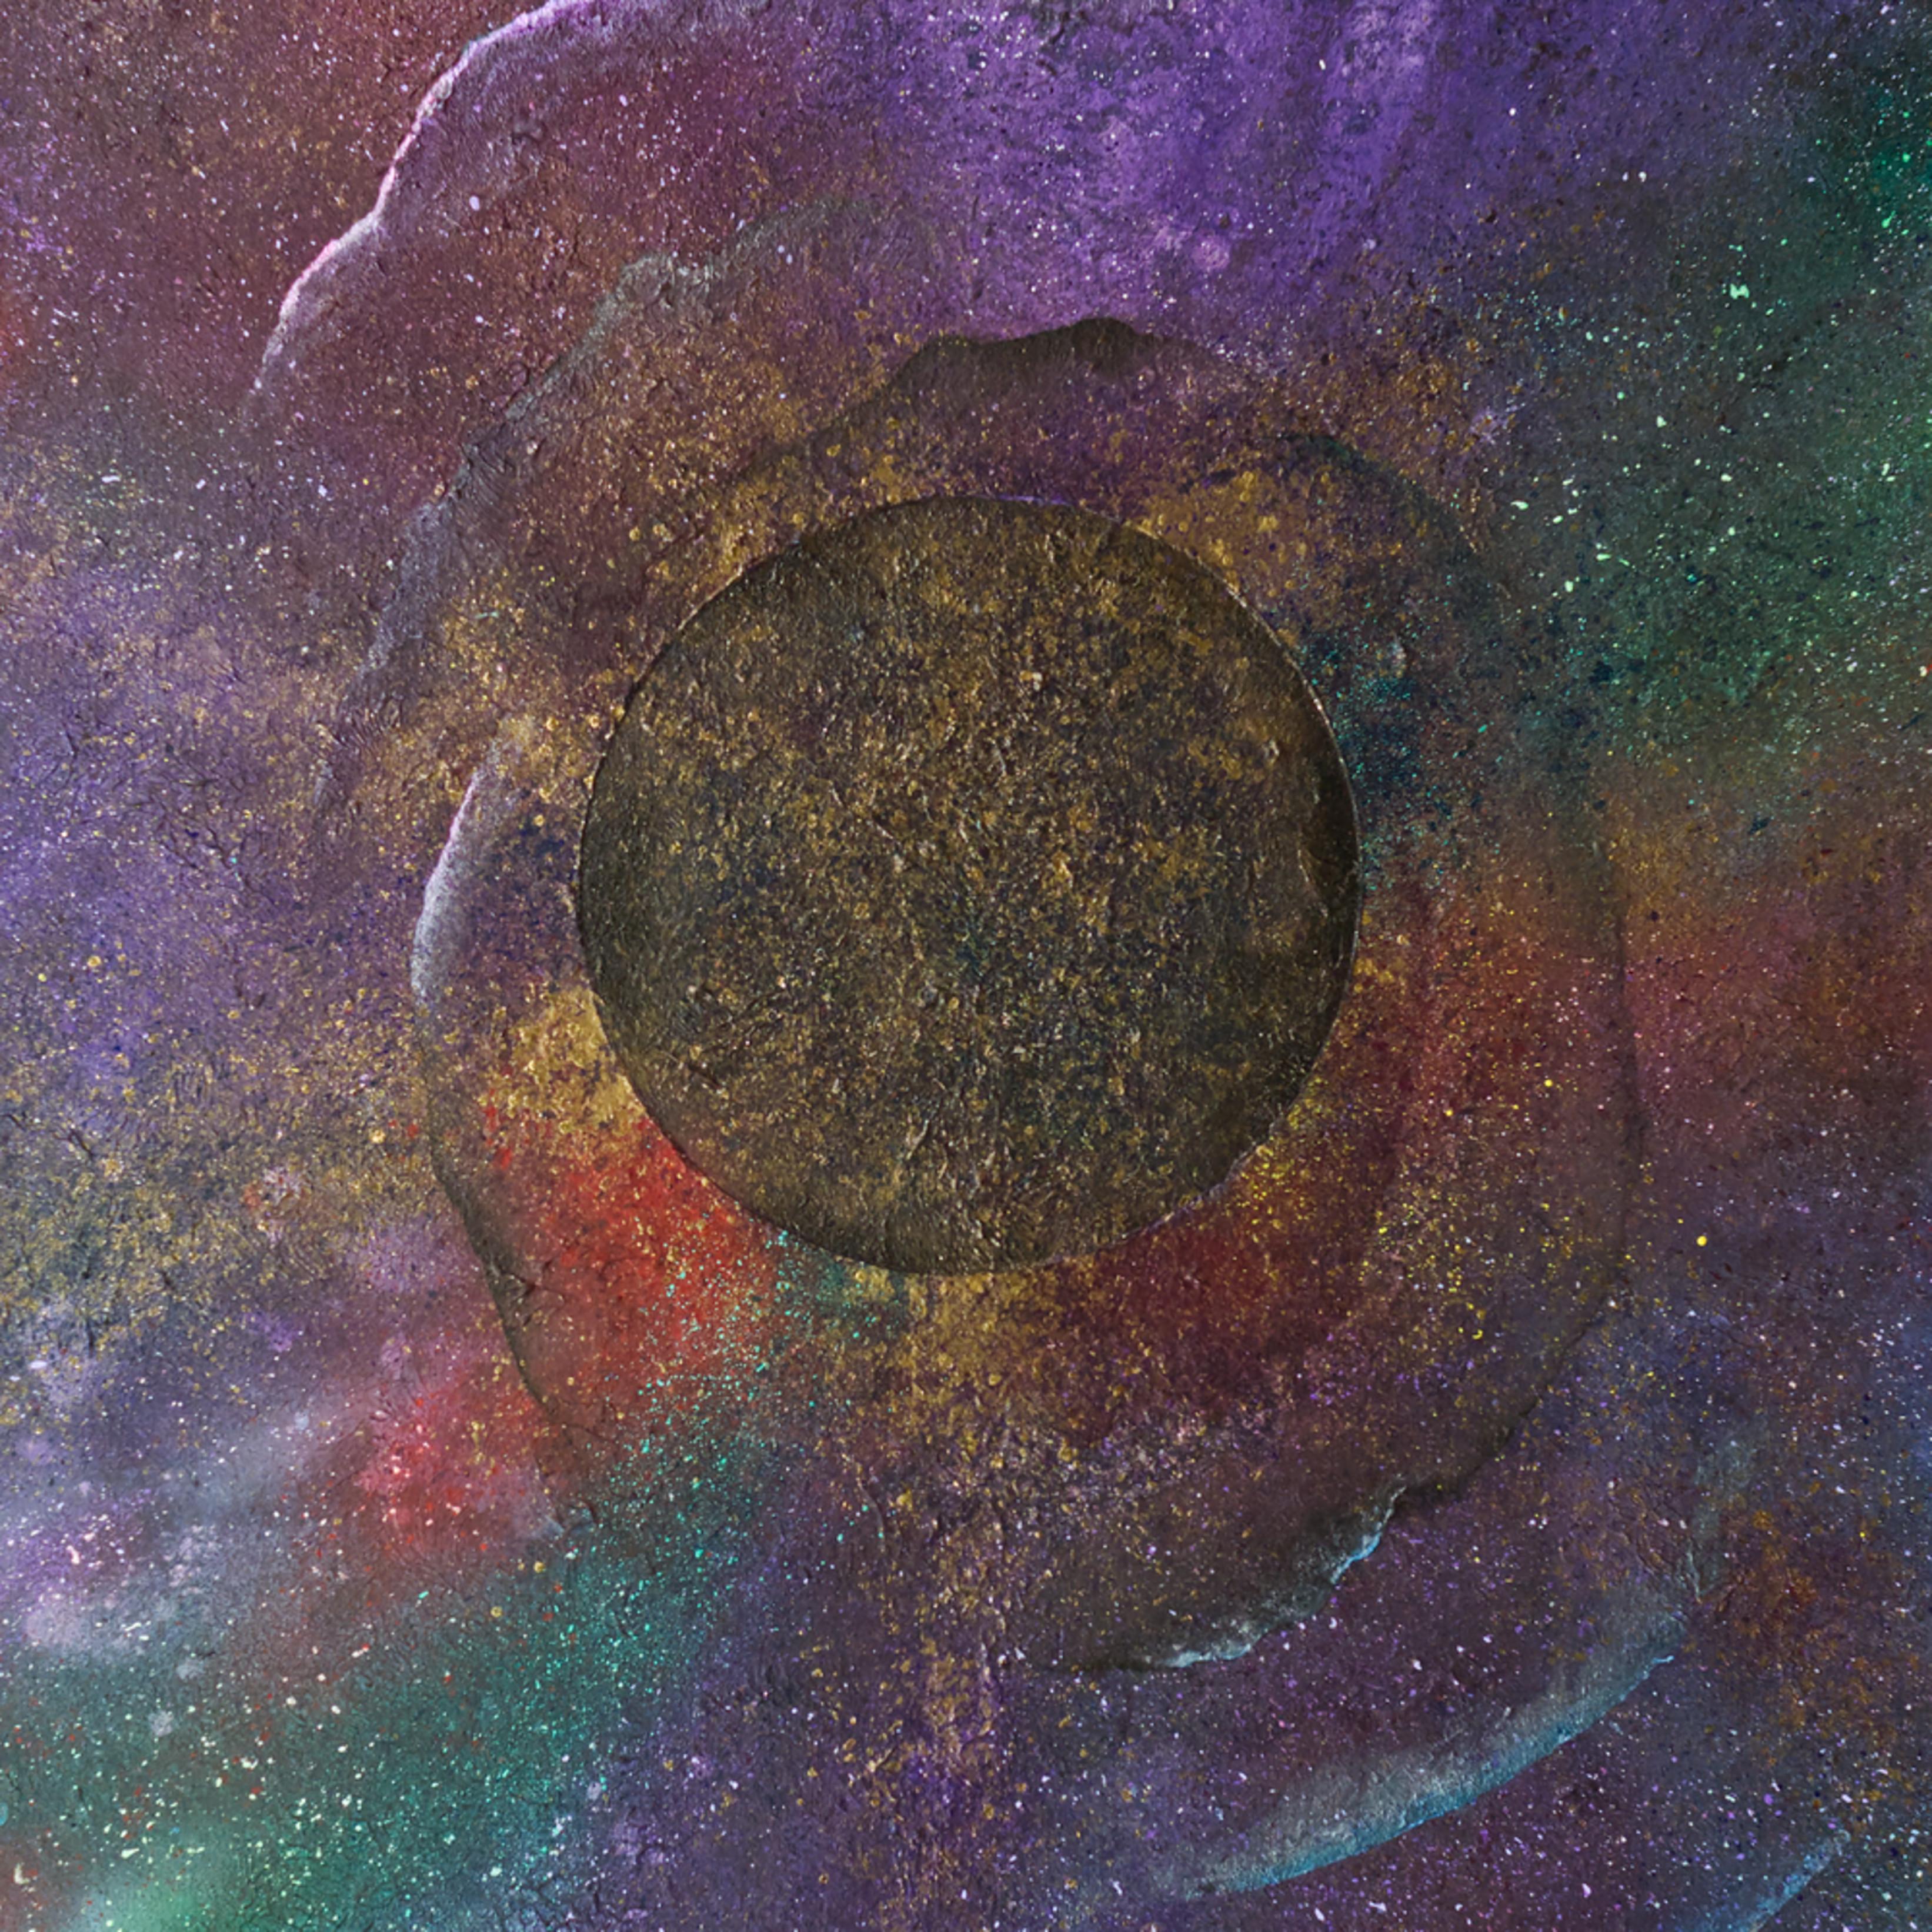 Event horizon 19 gtpk1n